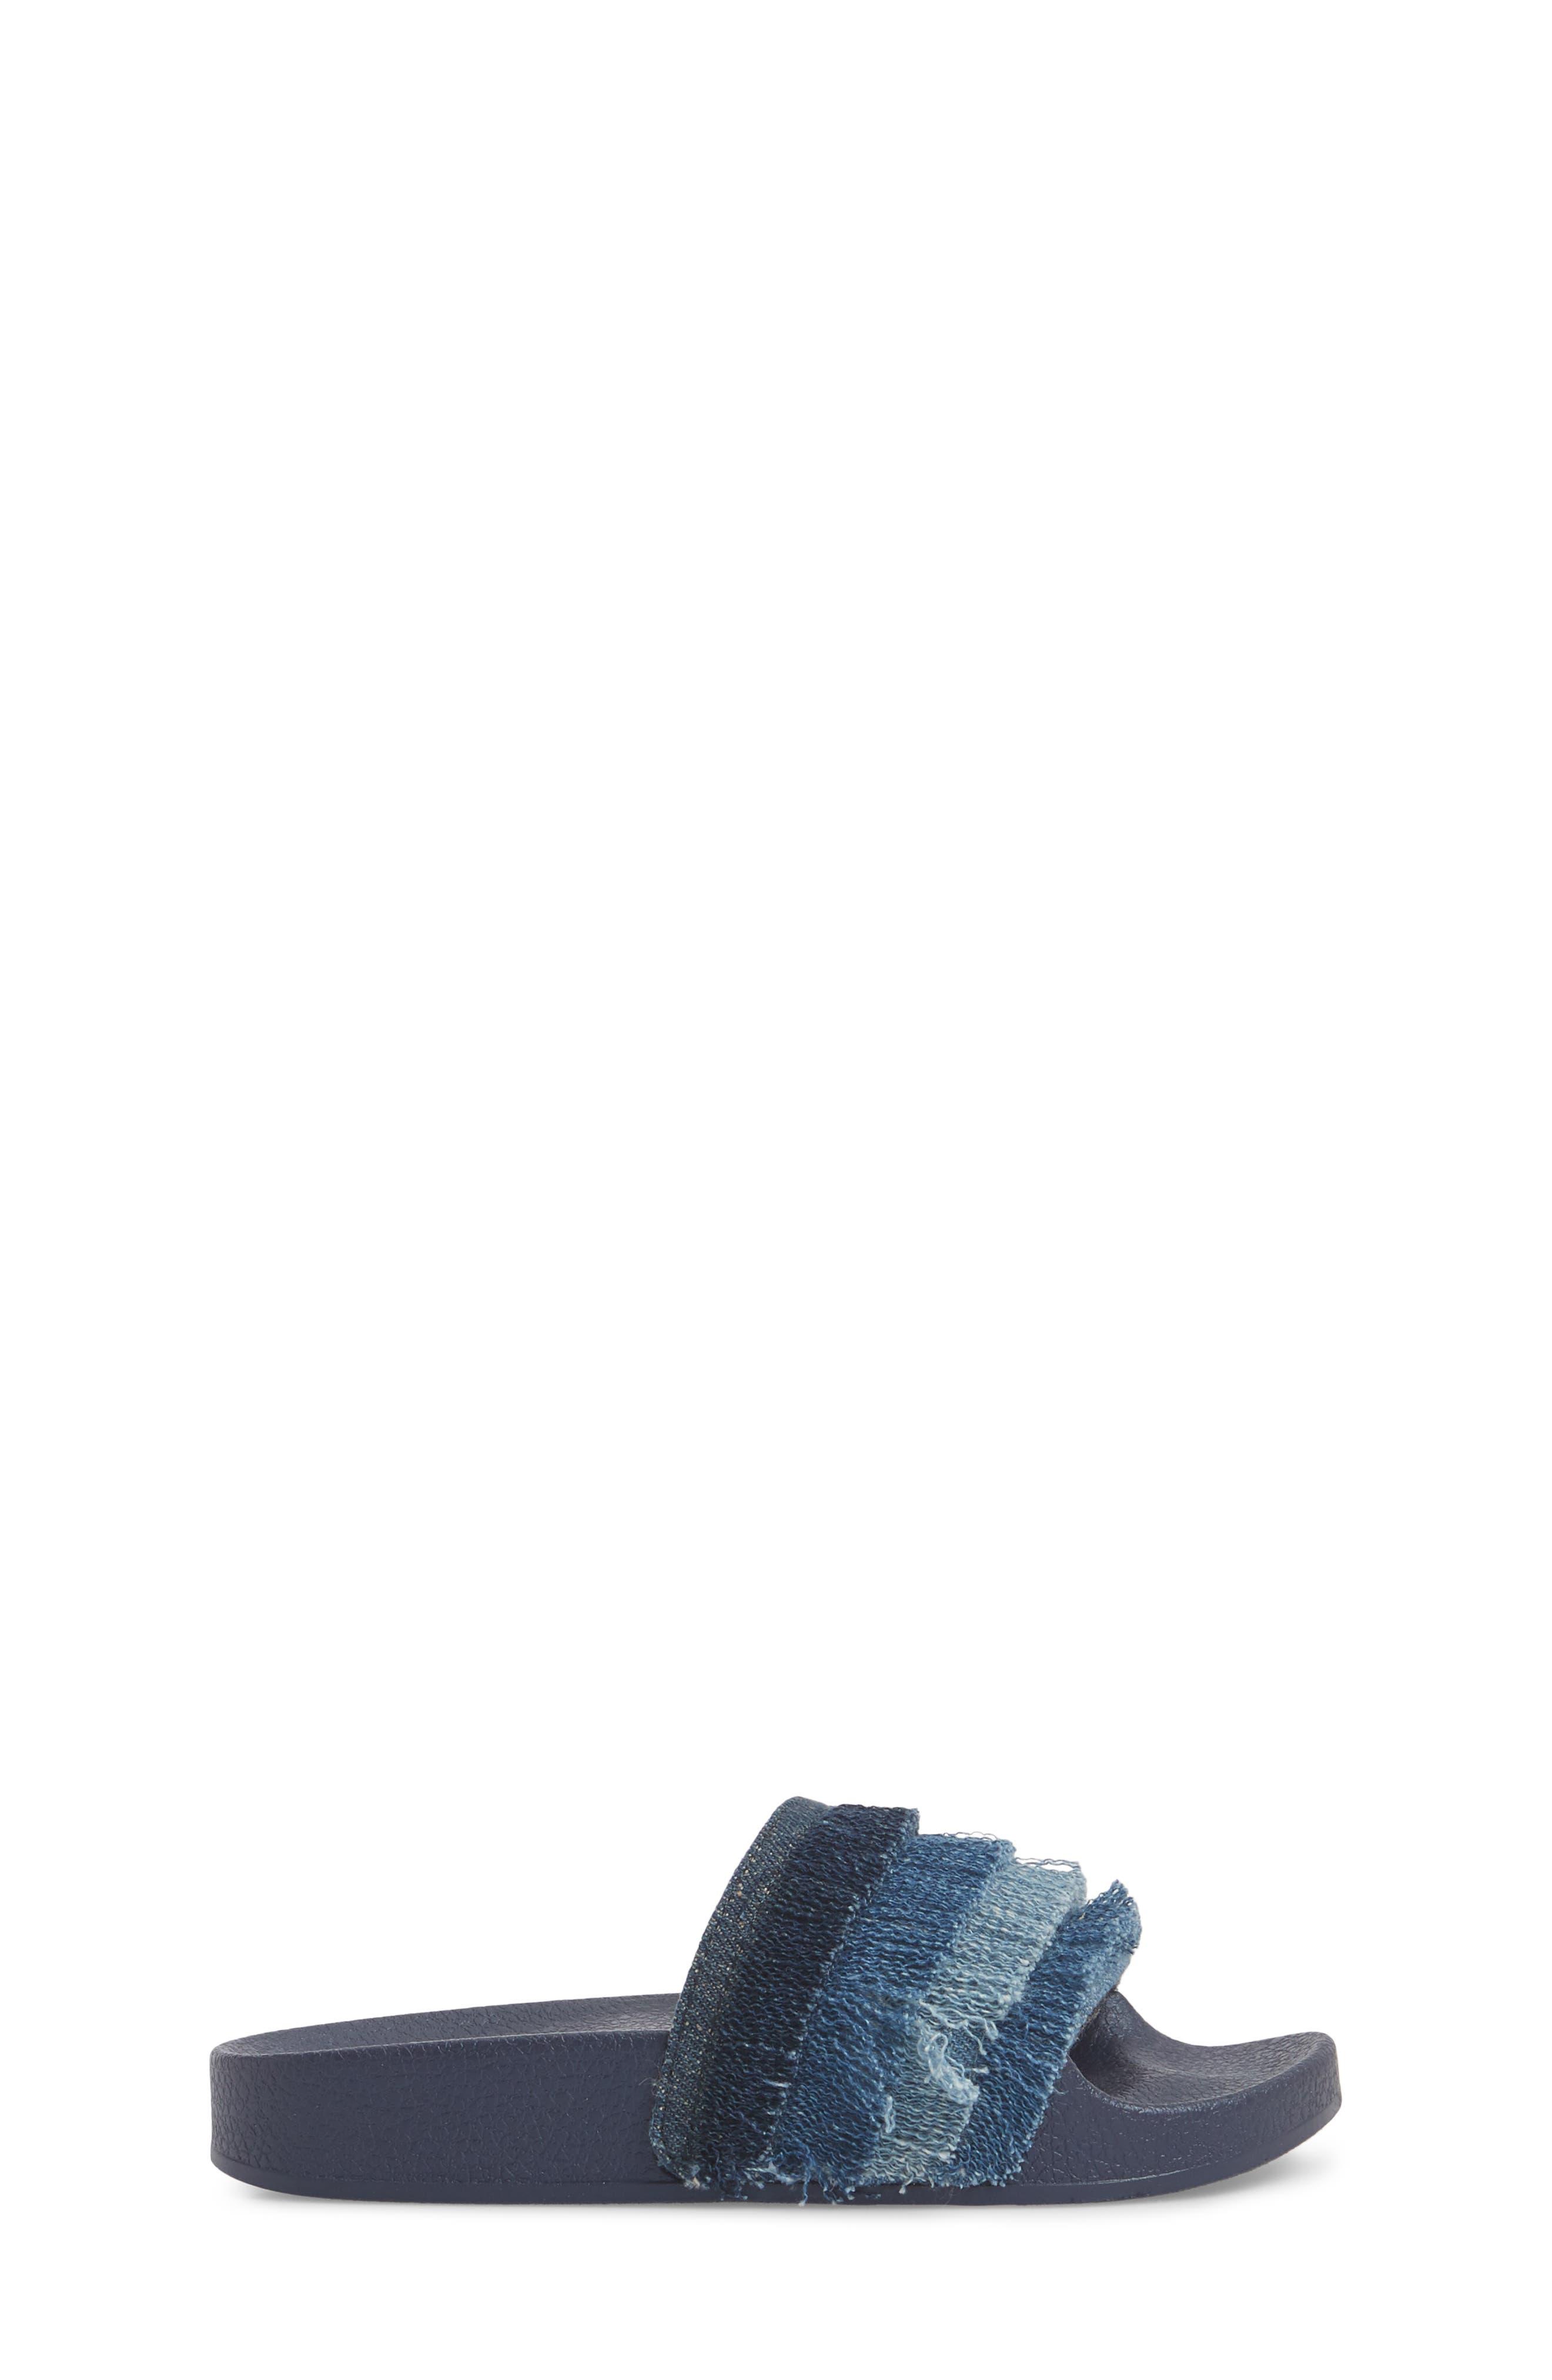 Reaction Kenneth Cole Shower Fray Slide Sandal,                             Alternate thumbnail 3, color,                             402